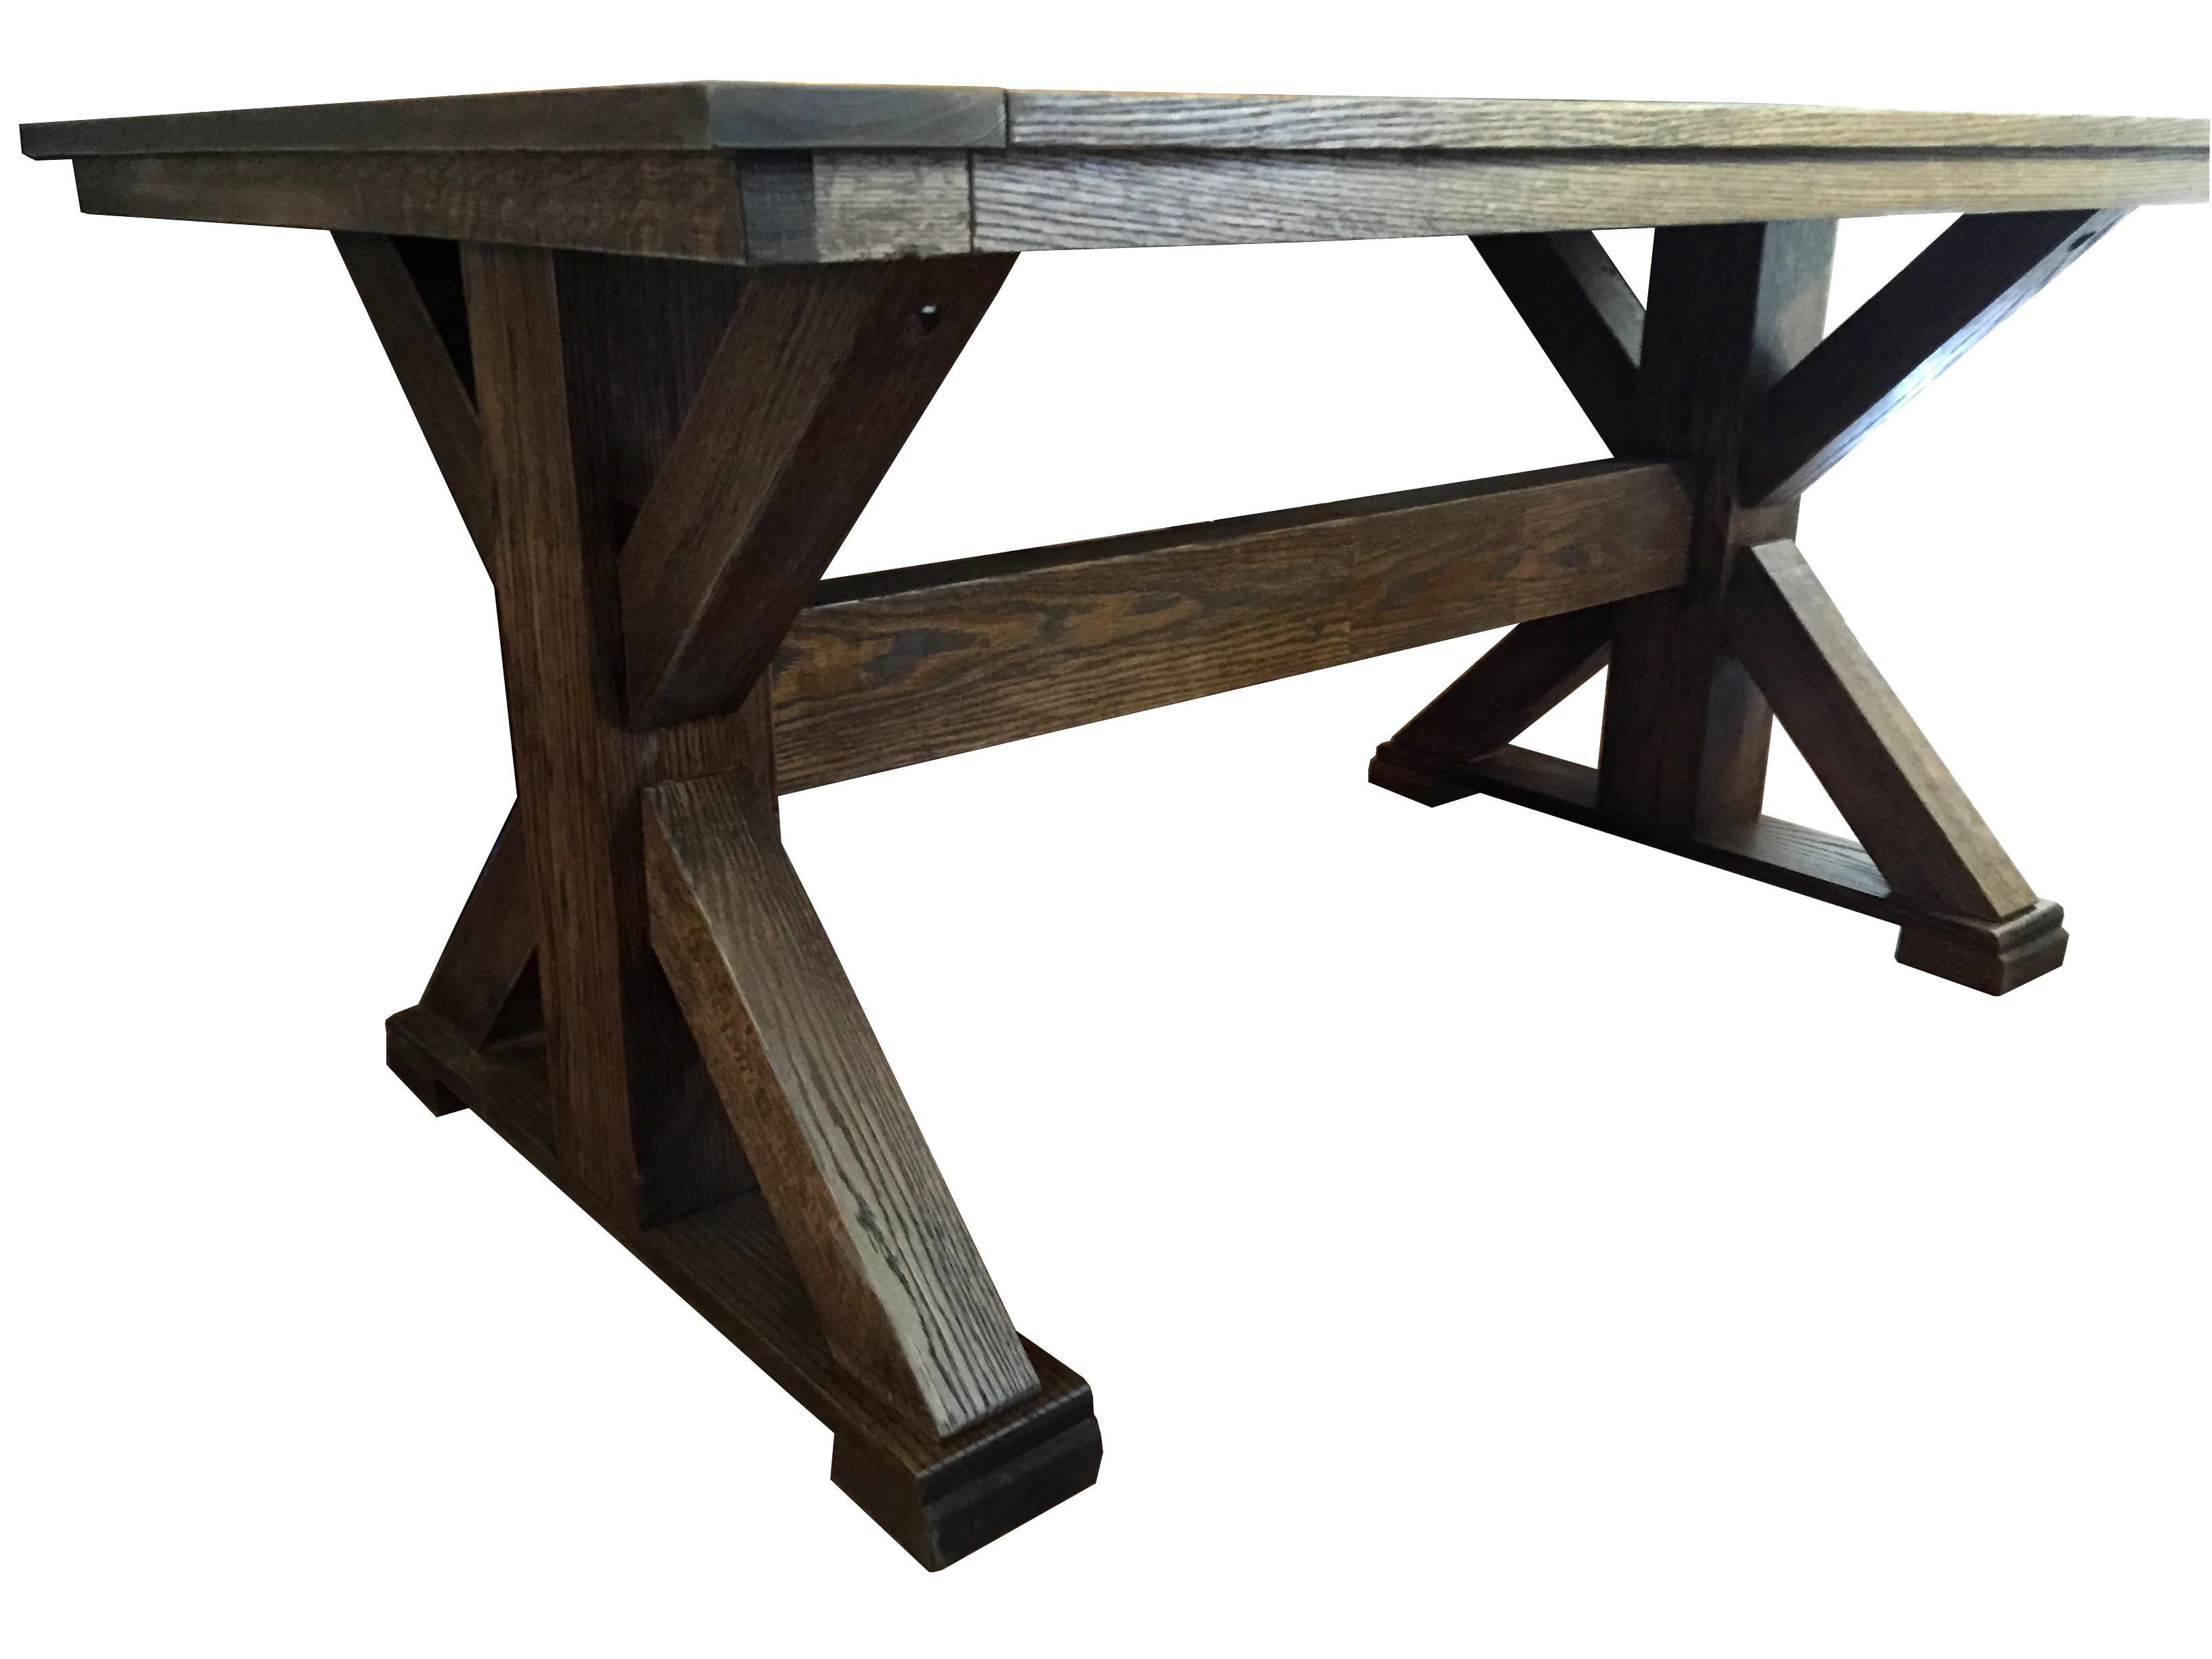 extending/fixed trestle table plans IDDCDYJ